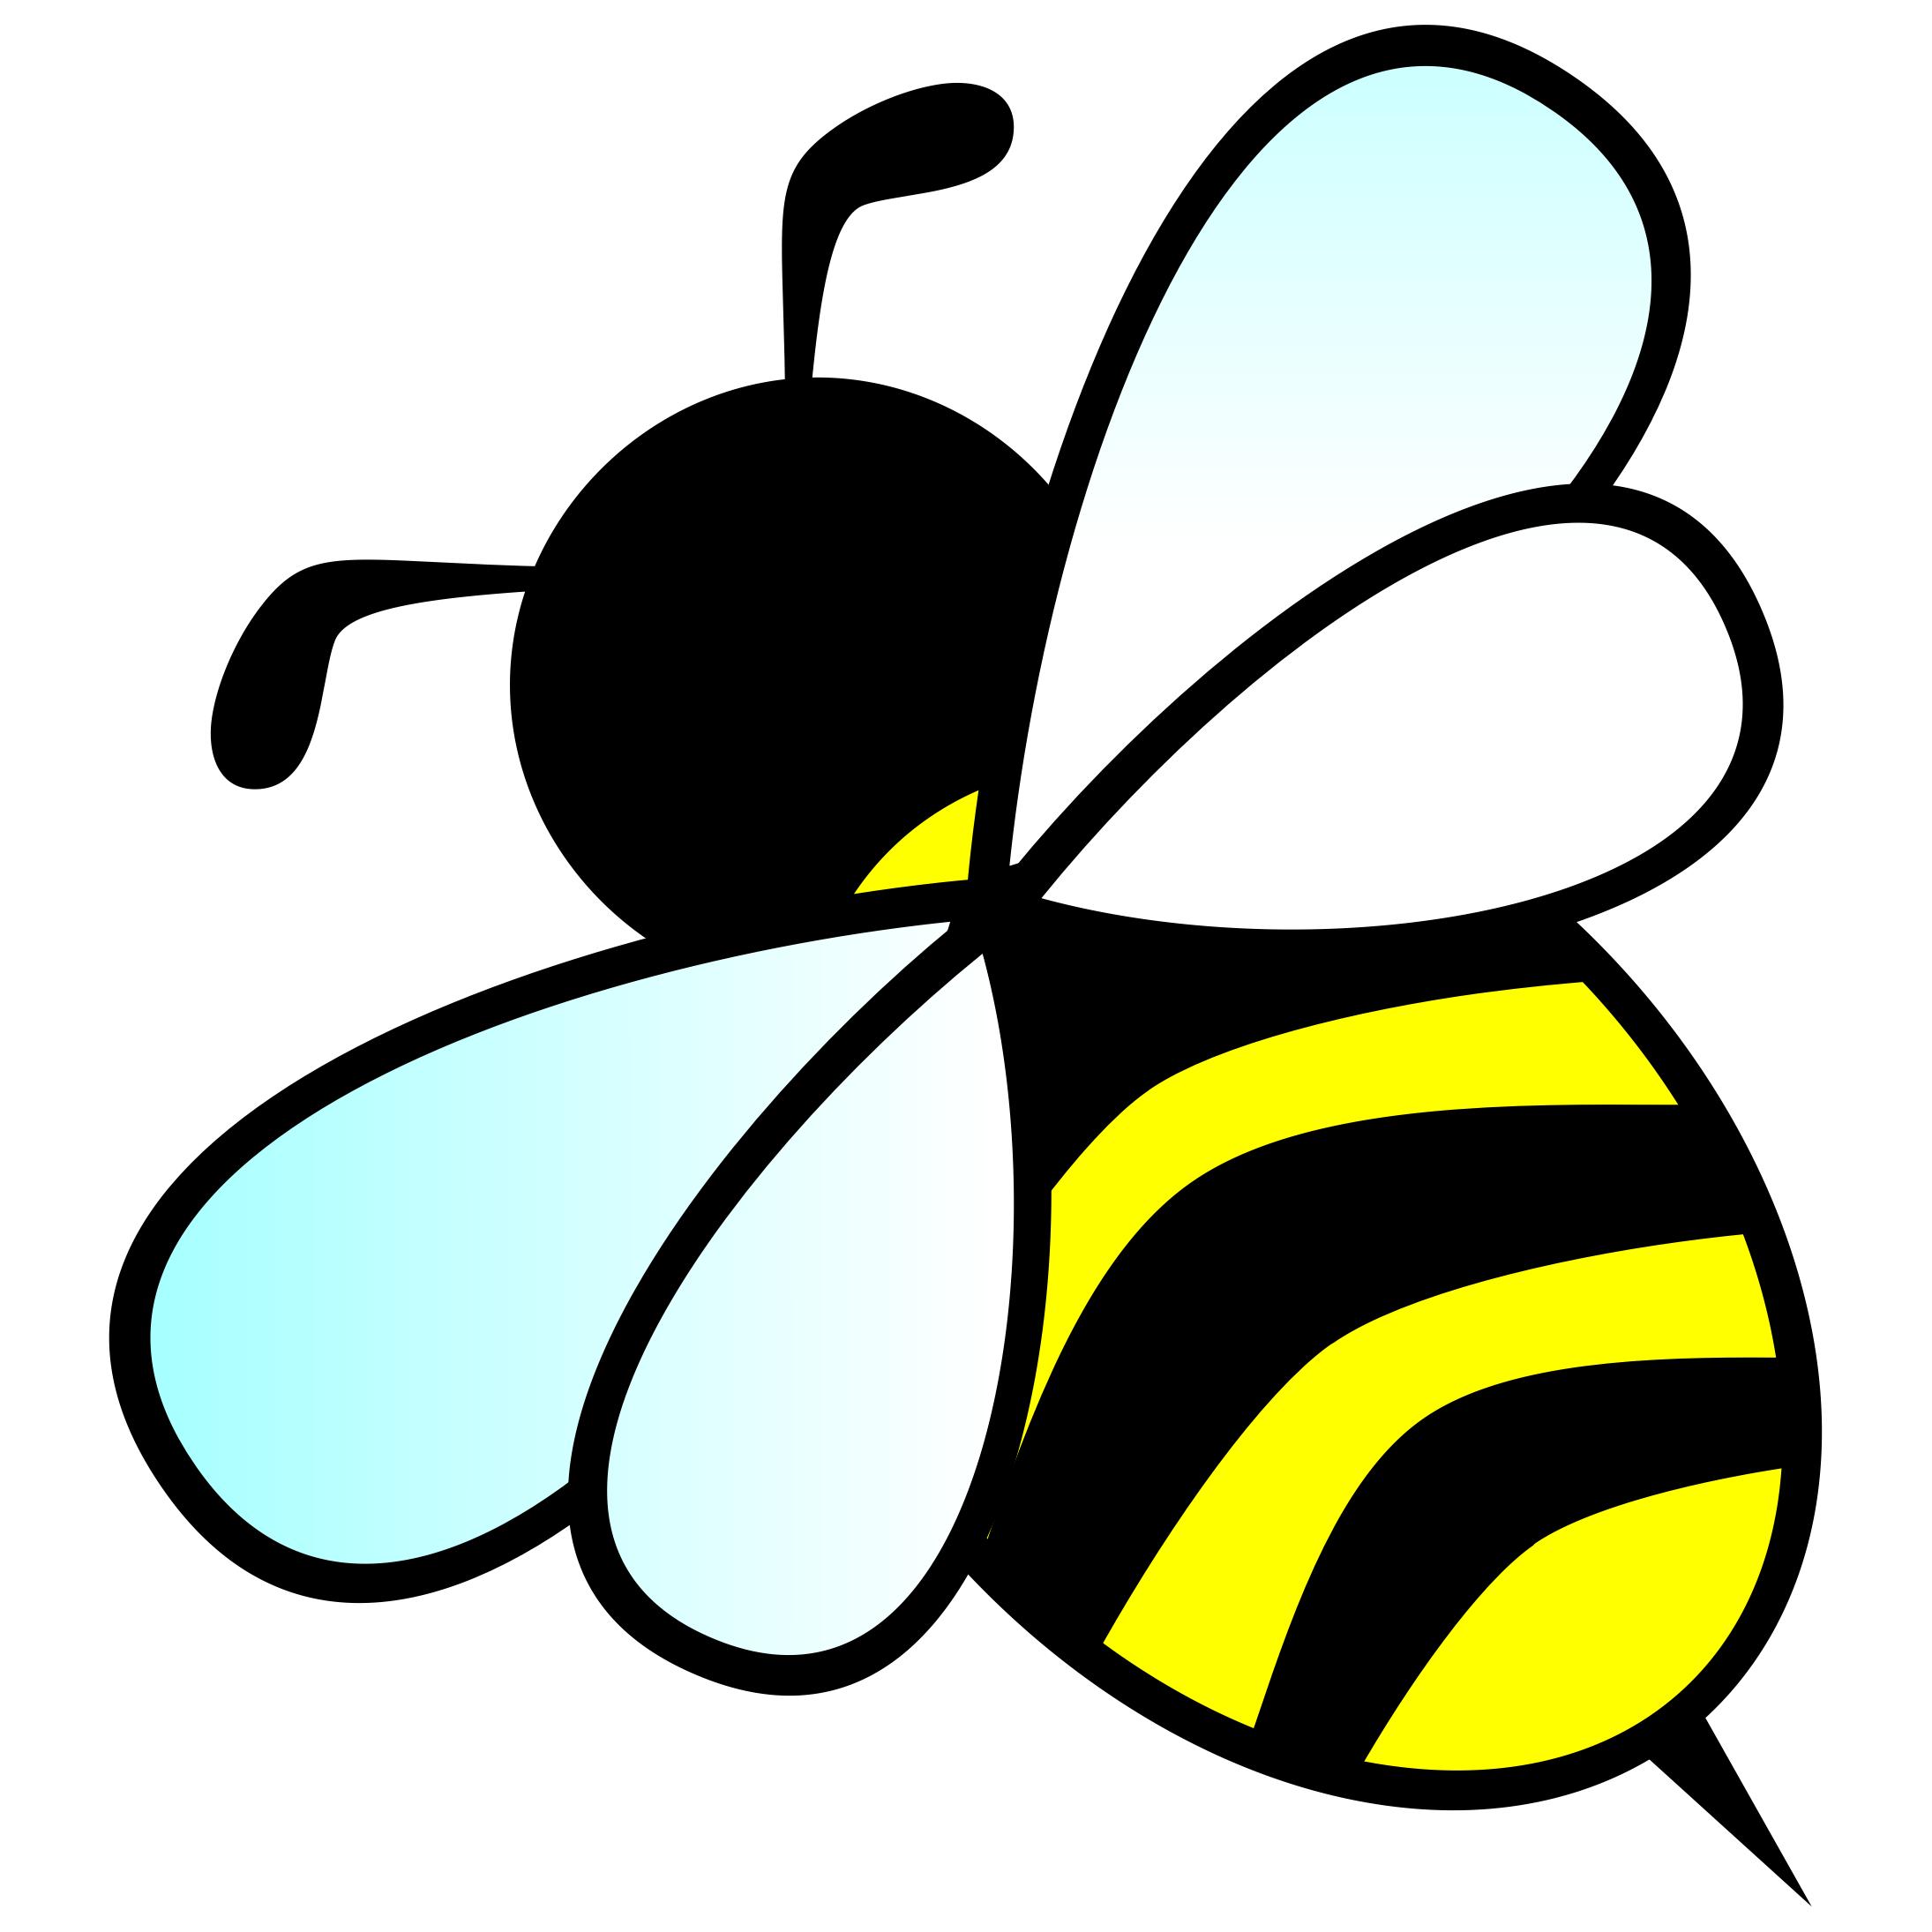 Bee clipart for teachers 4570book hd ultra bumble bee clipart for teachers  pack 5799 | Jessie.captainamericagifts.com